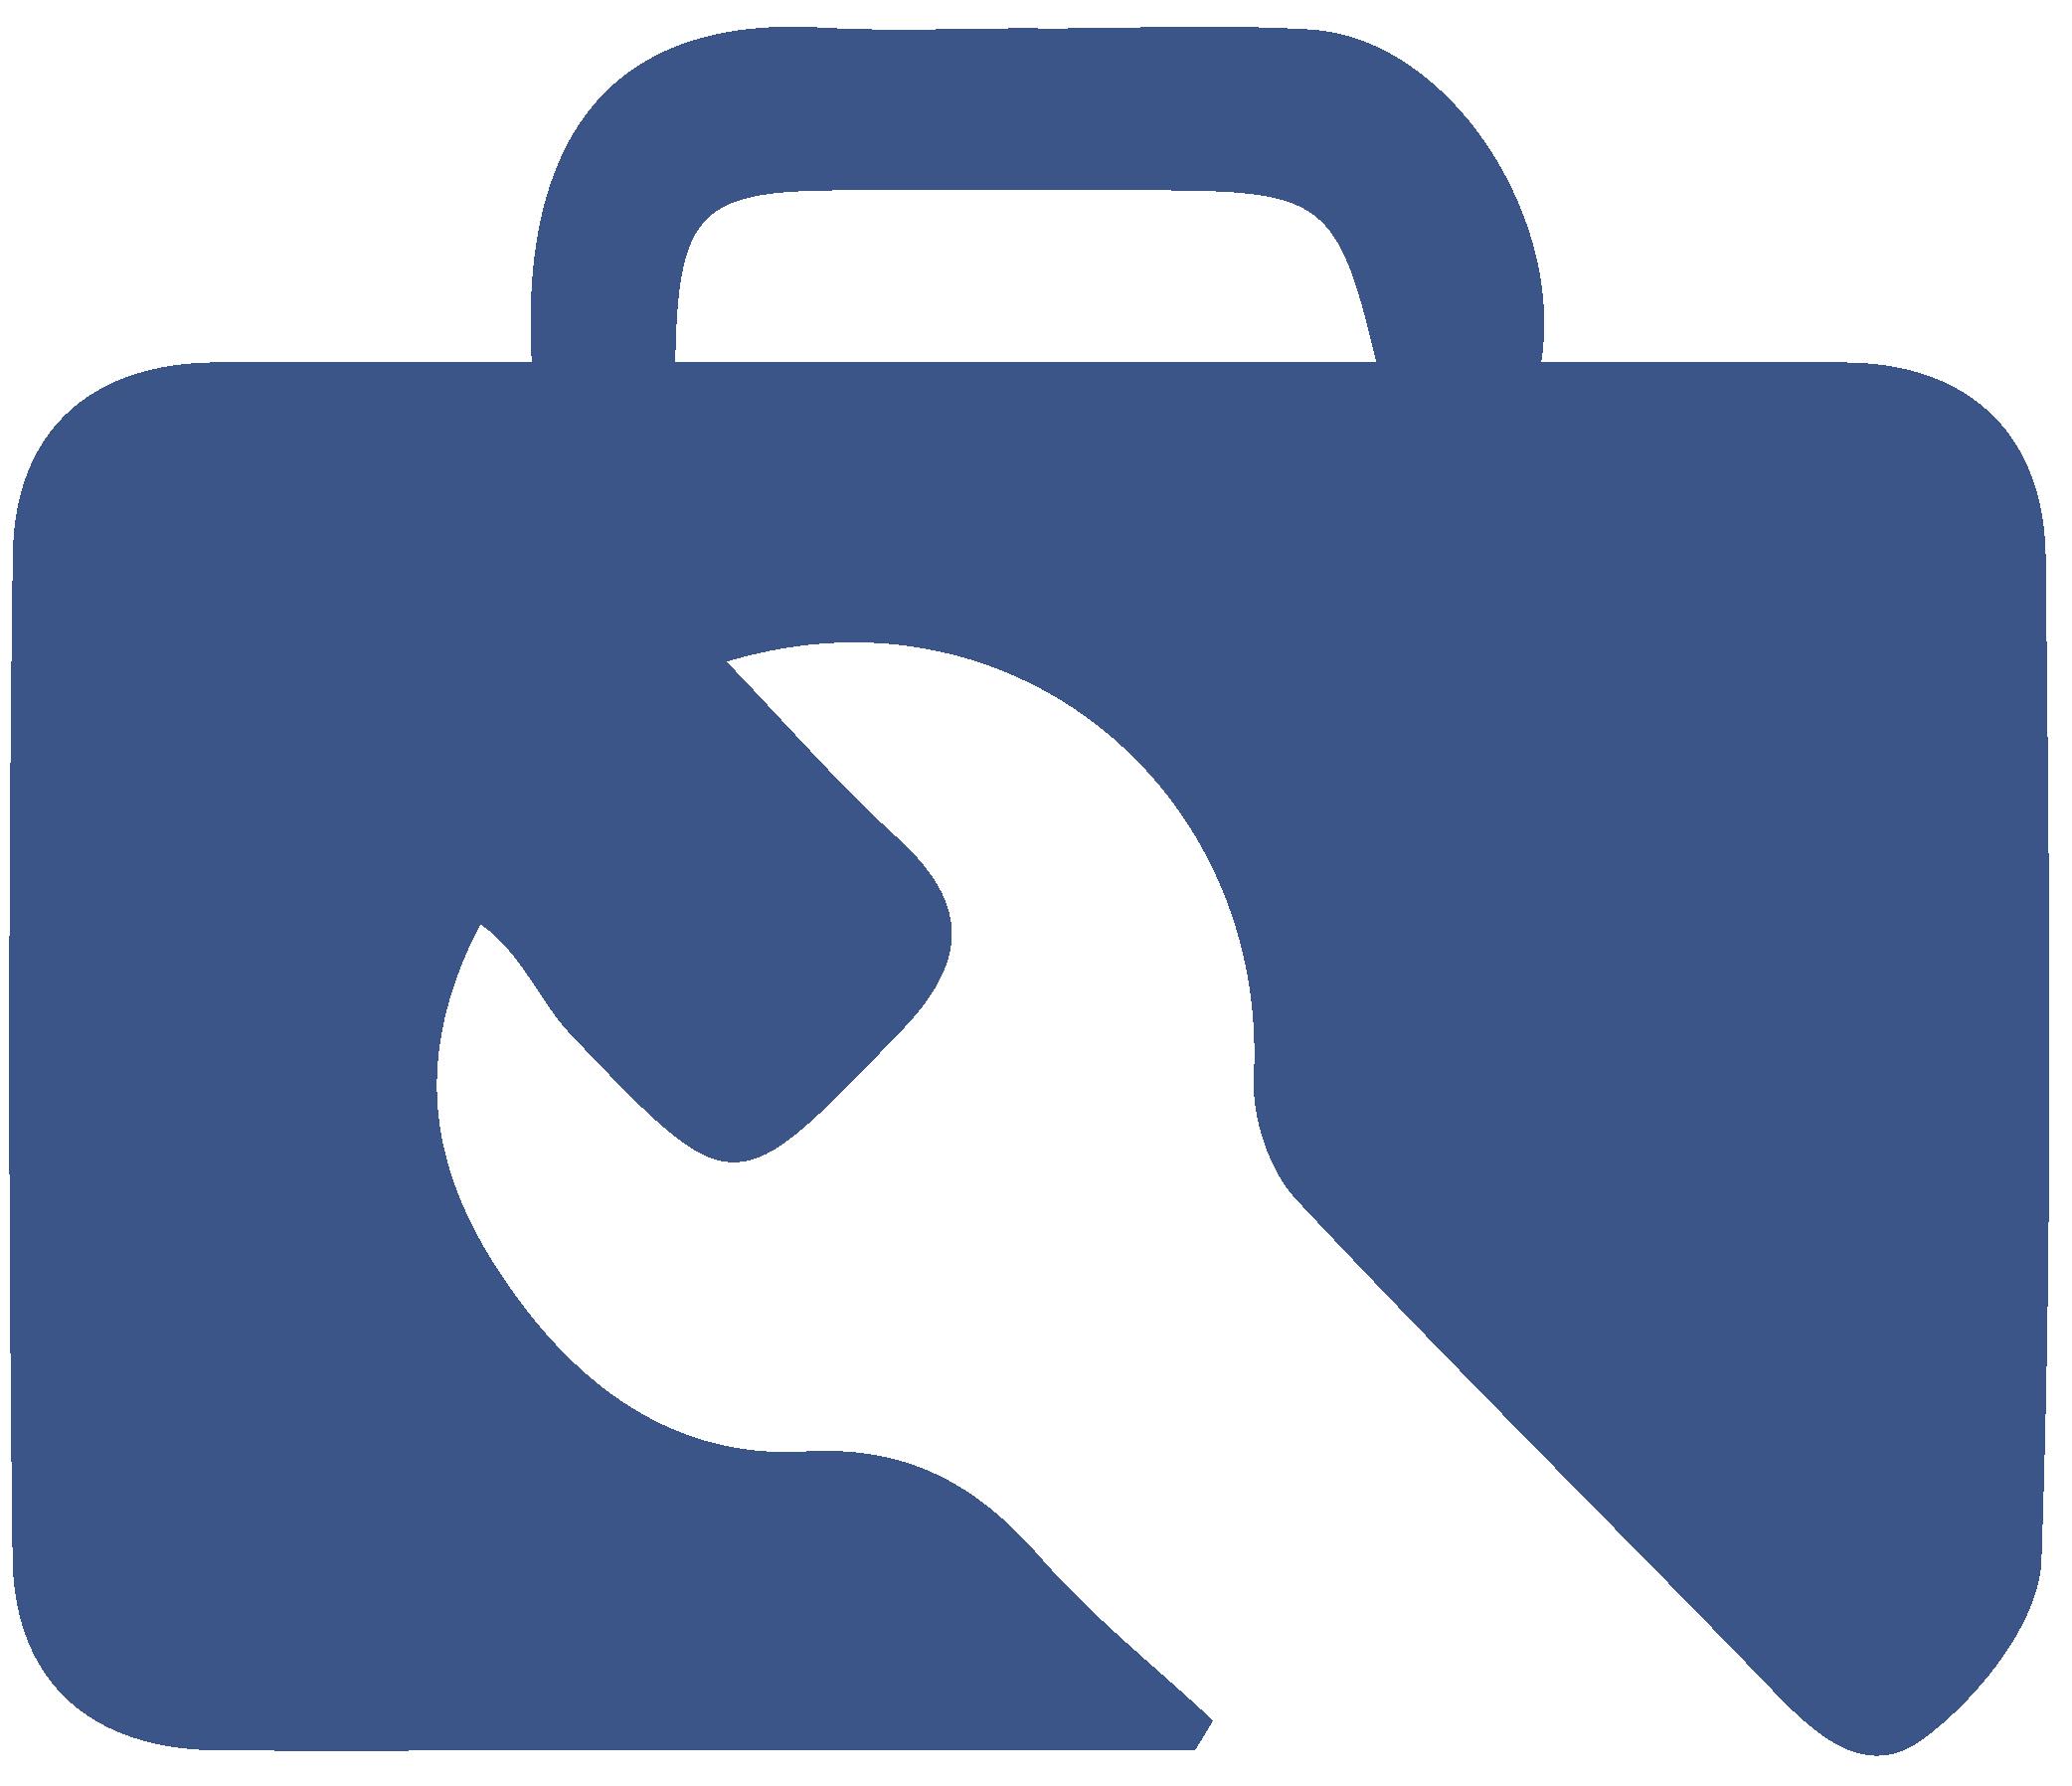 organiser icon